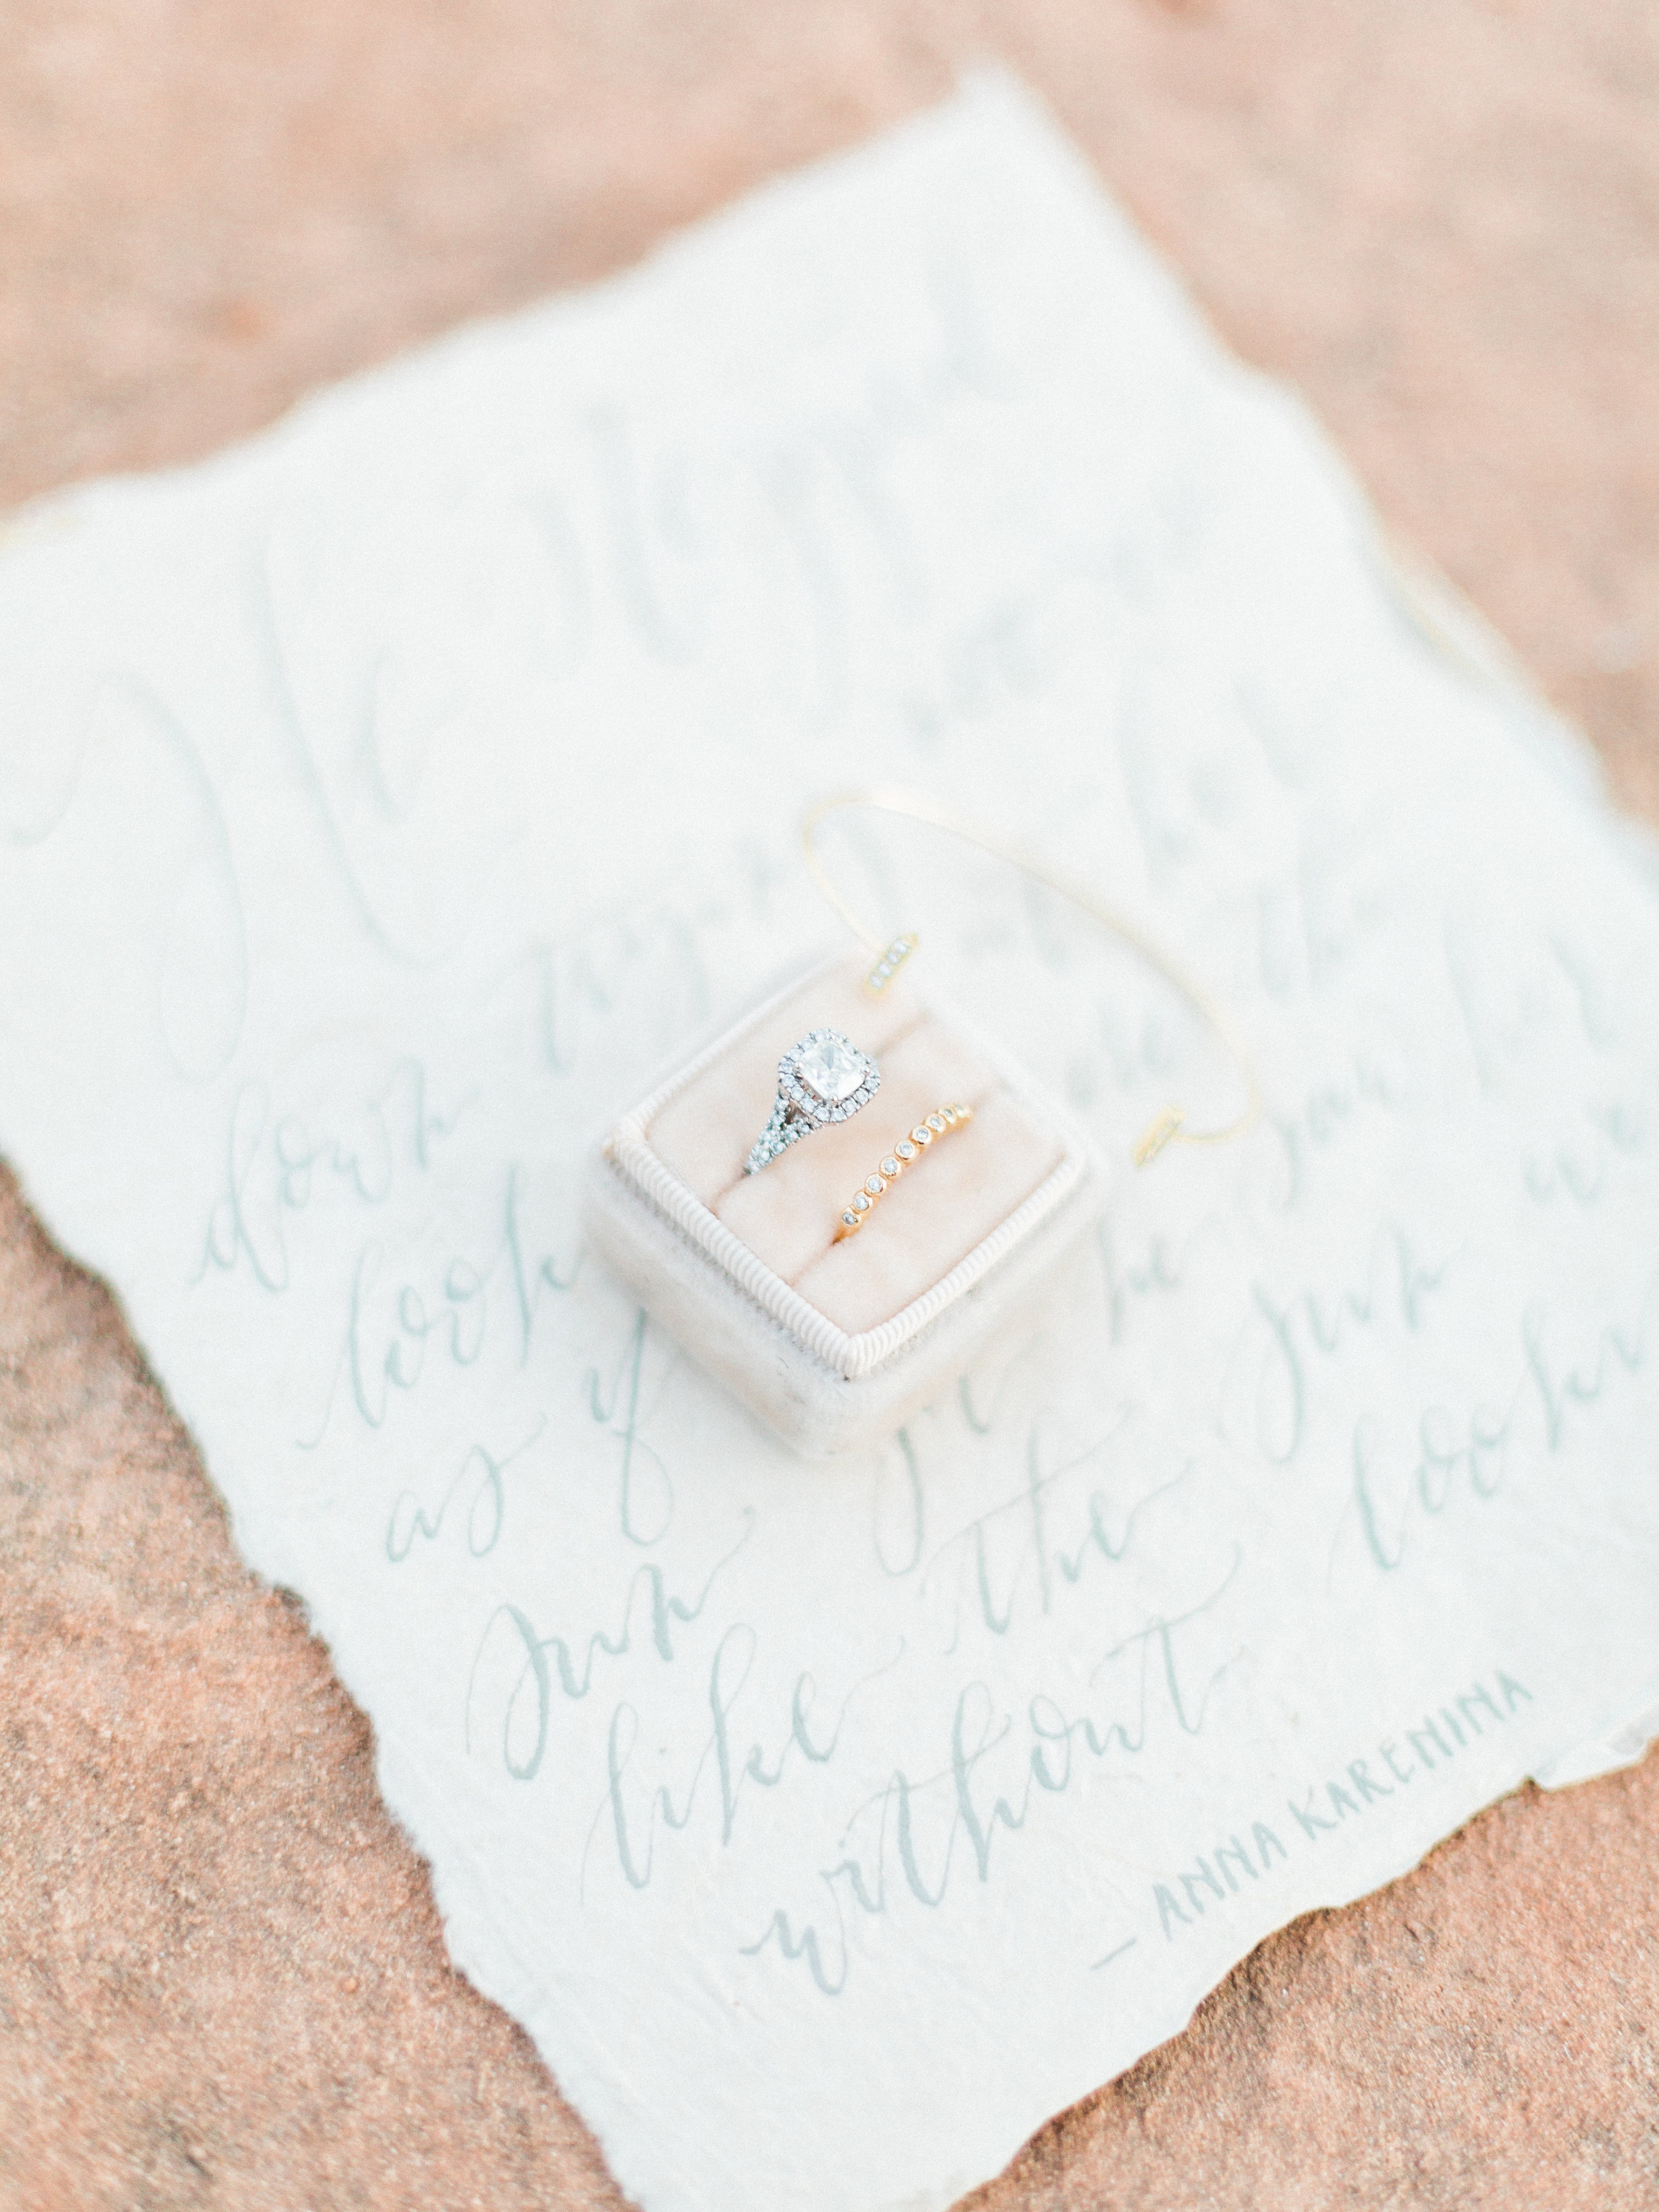 Callie Manion Photography_Pastel Desert Wedding Inspiration_133.jpg